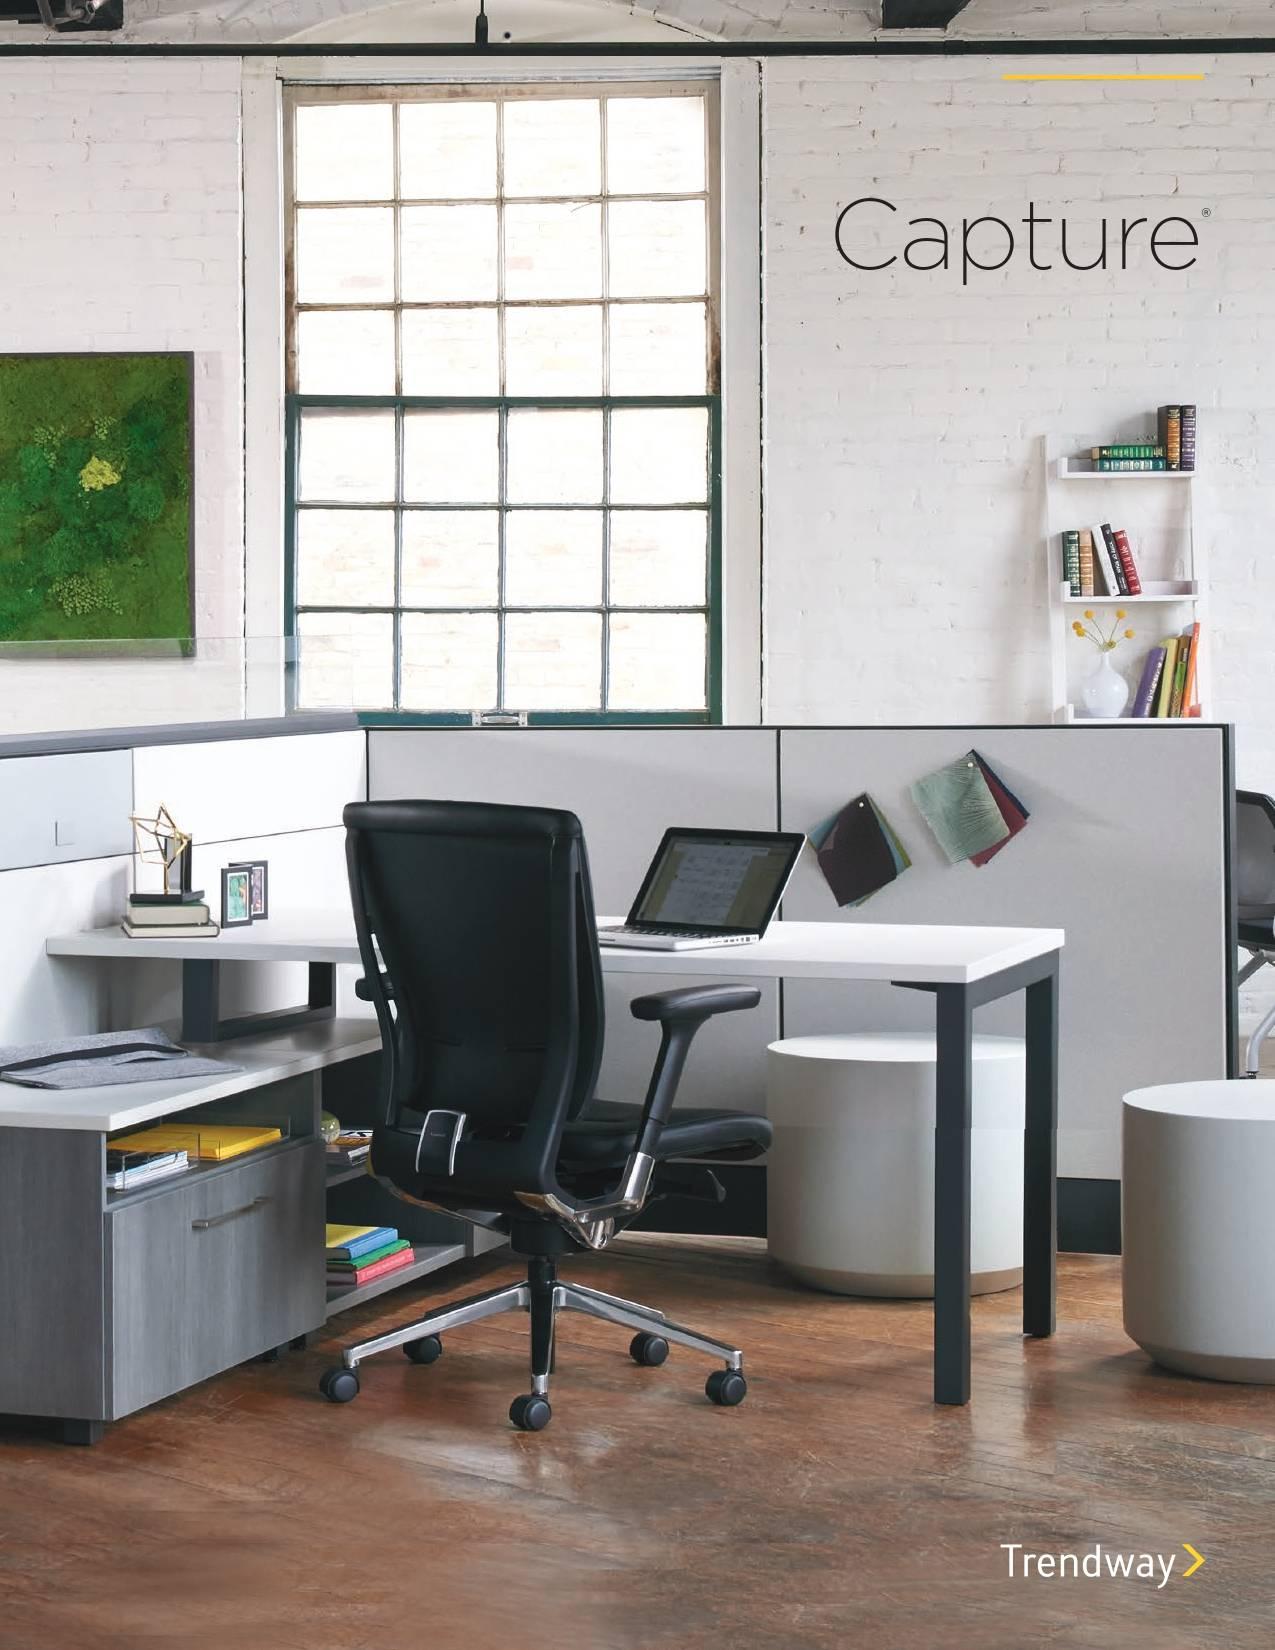 TrendwayFurniture Capture Systems Brochure